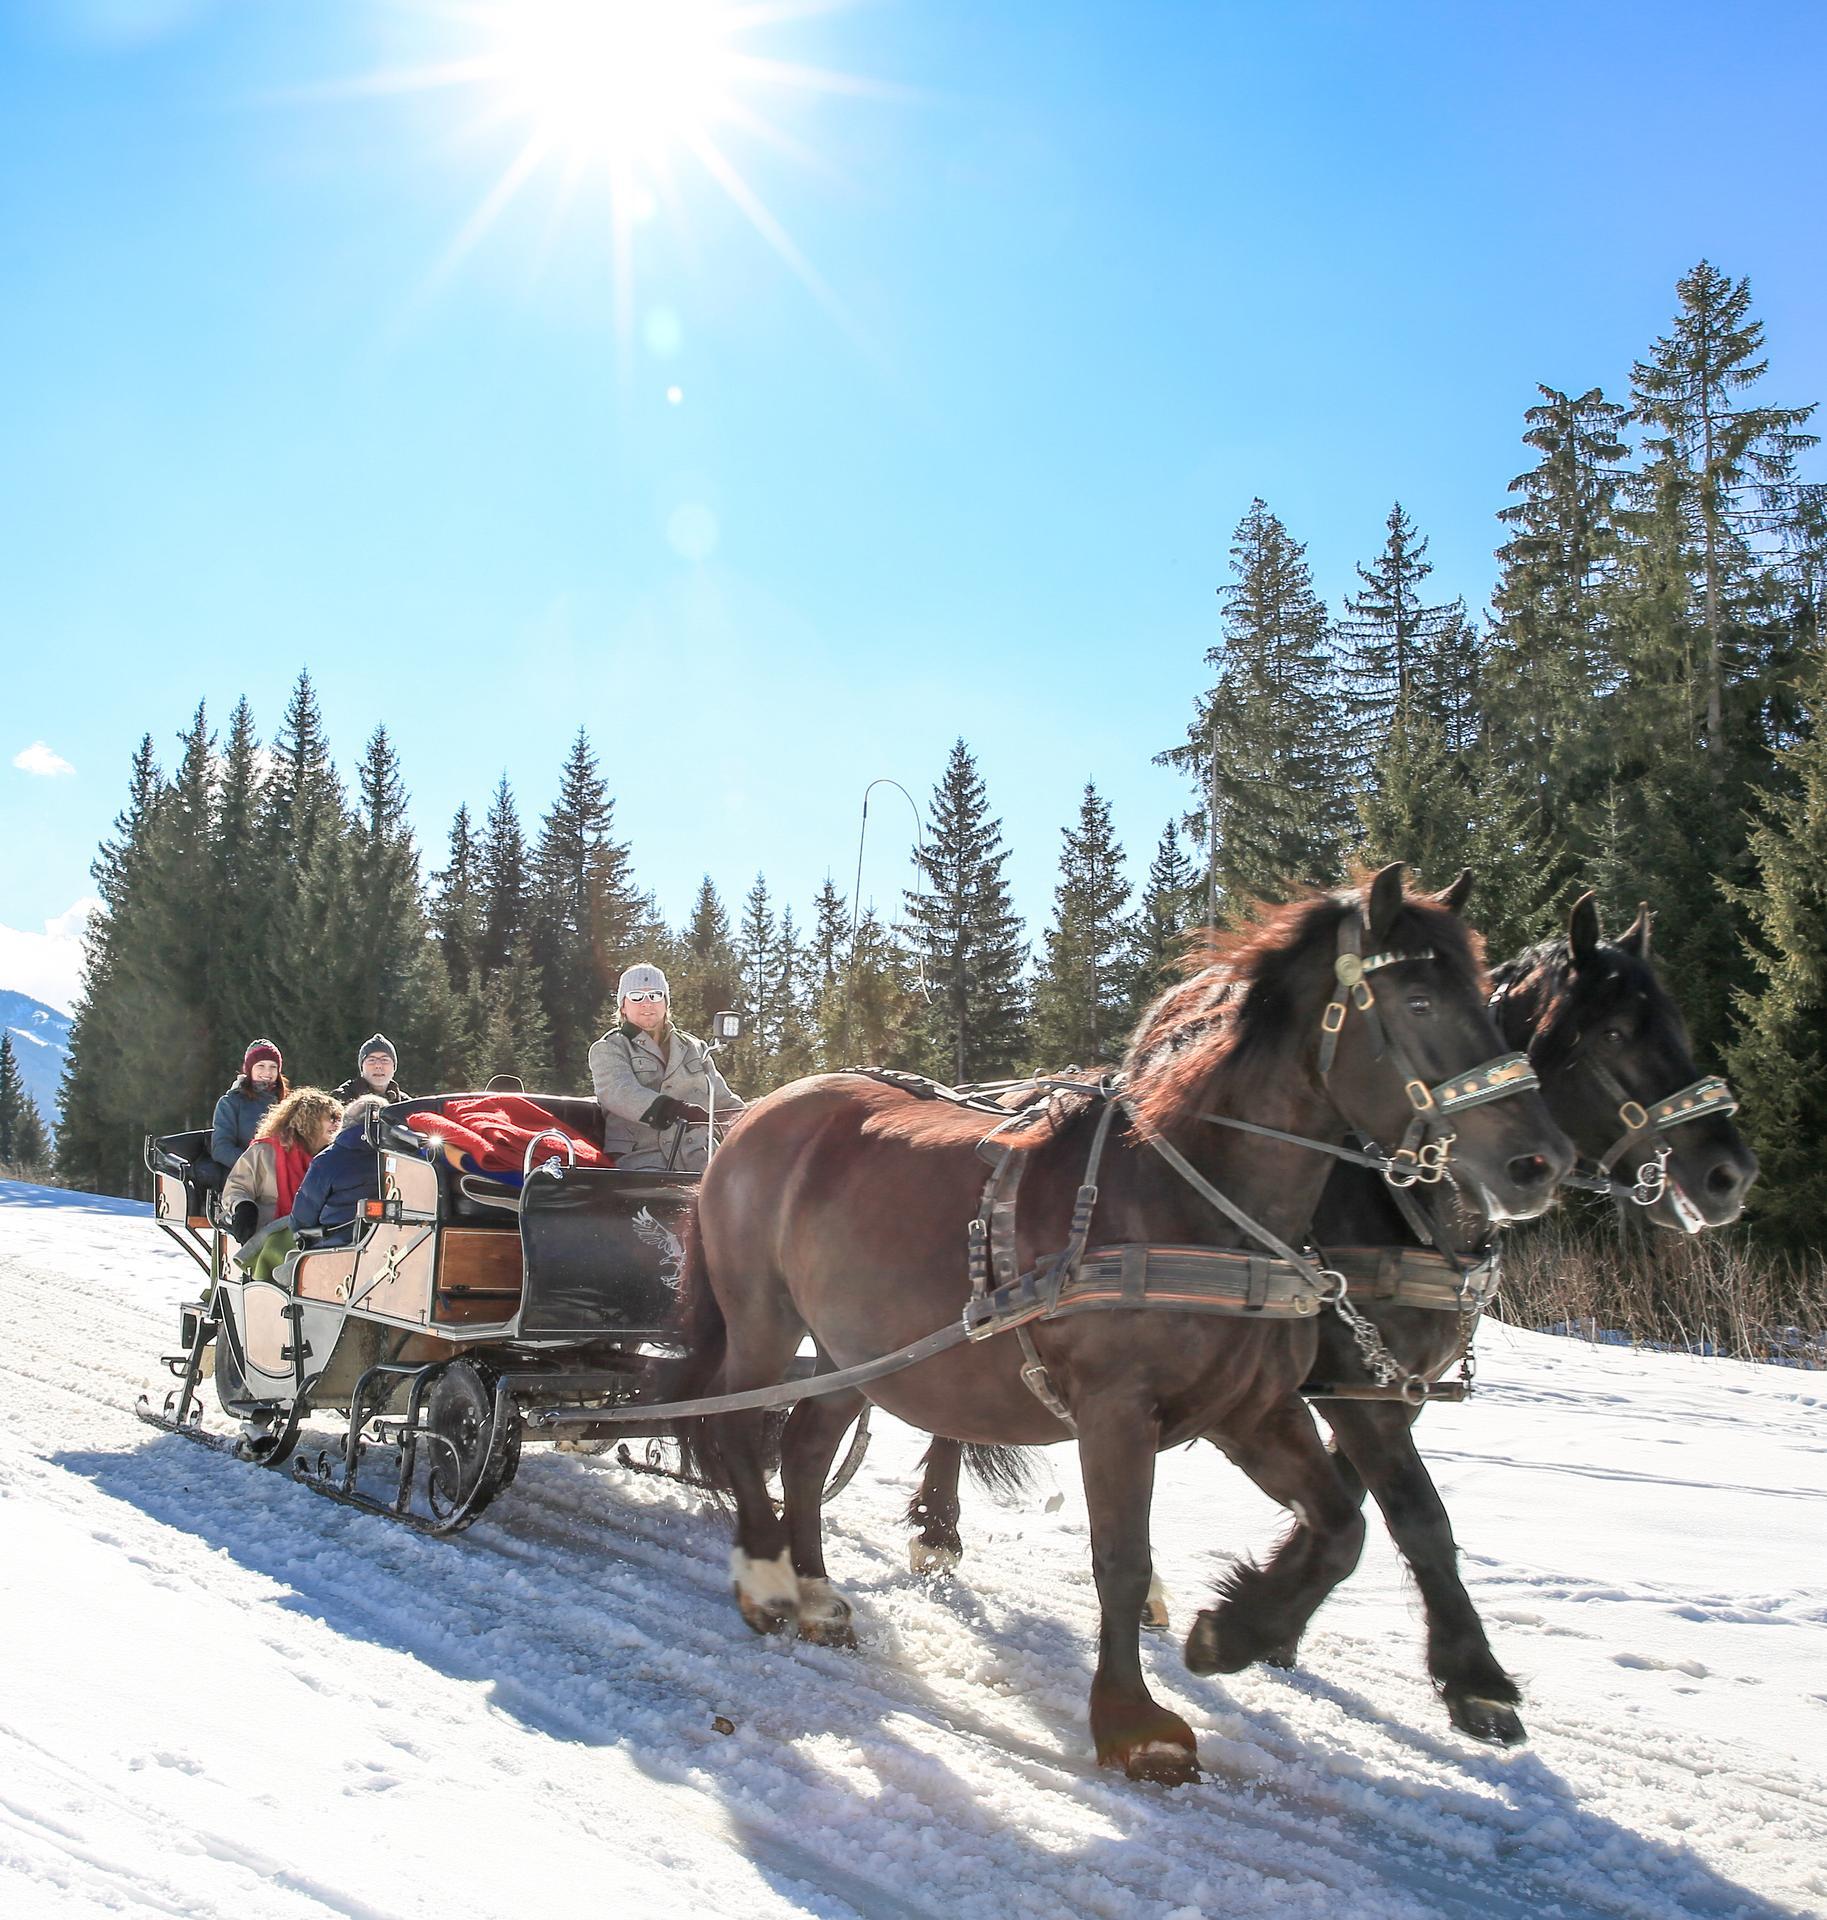 Pferdeschlitten Fahrt 2258 c photo austria at Martin Huber